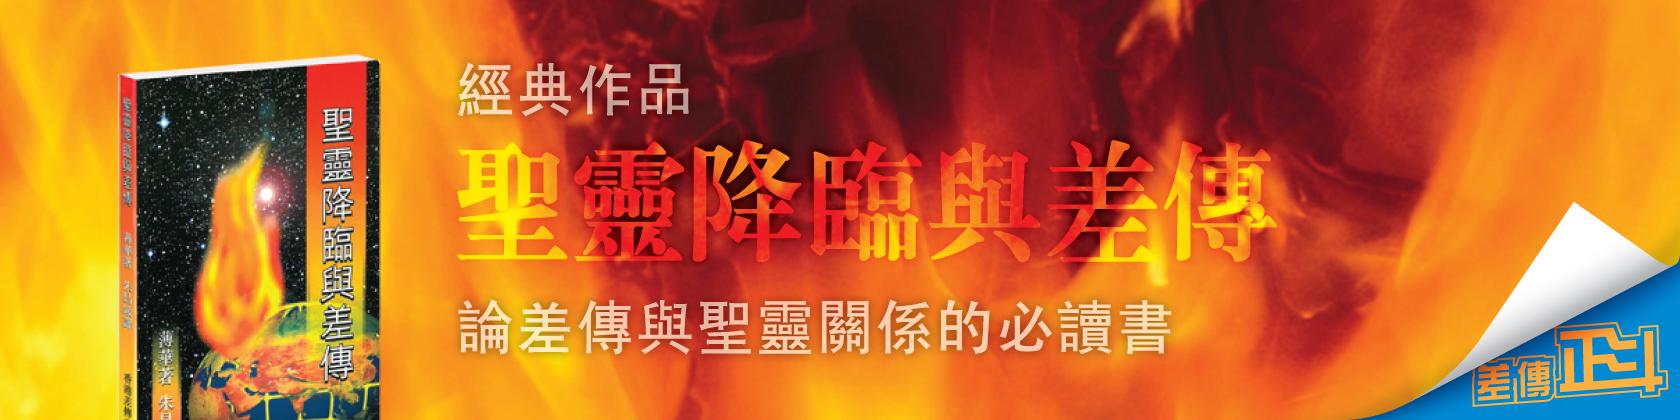 CB-01-web-banner-1680-x-420-B1-03